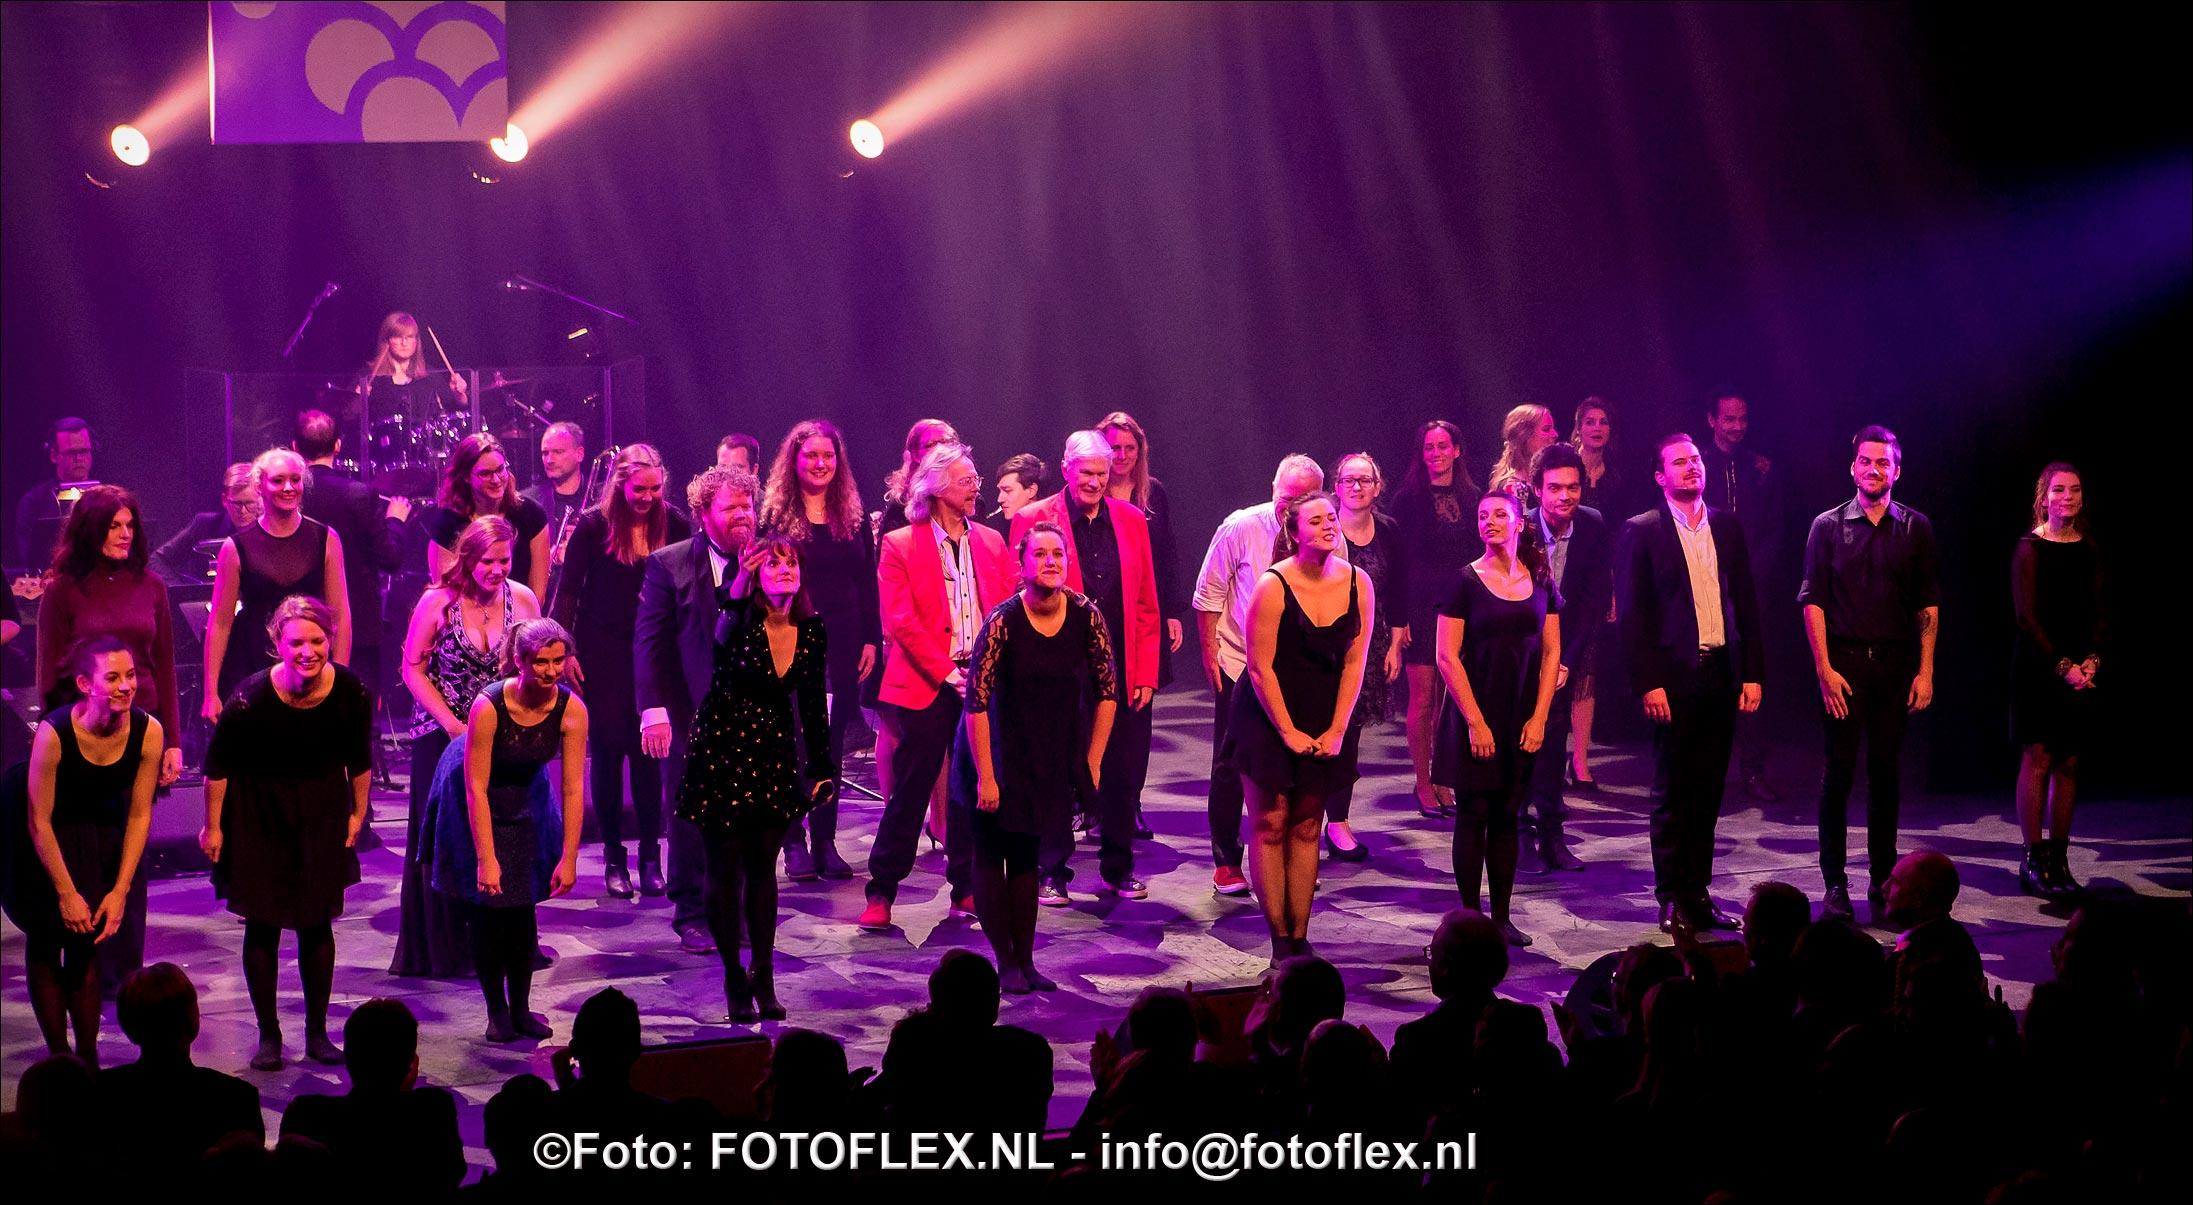 0670-CopyrightFOTOFLEX.NL07012020